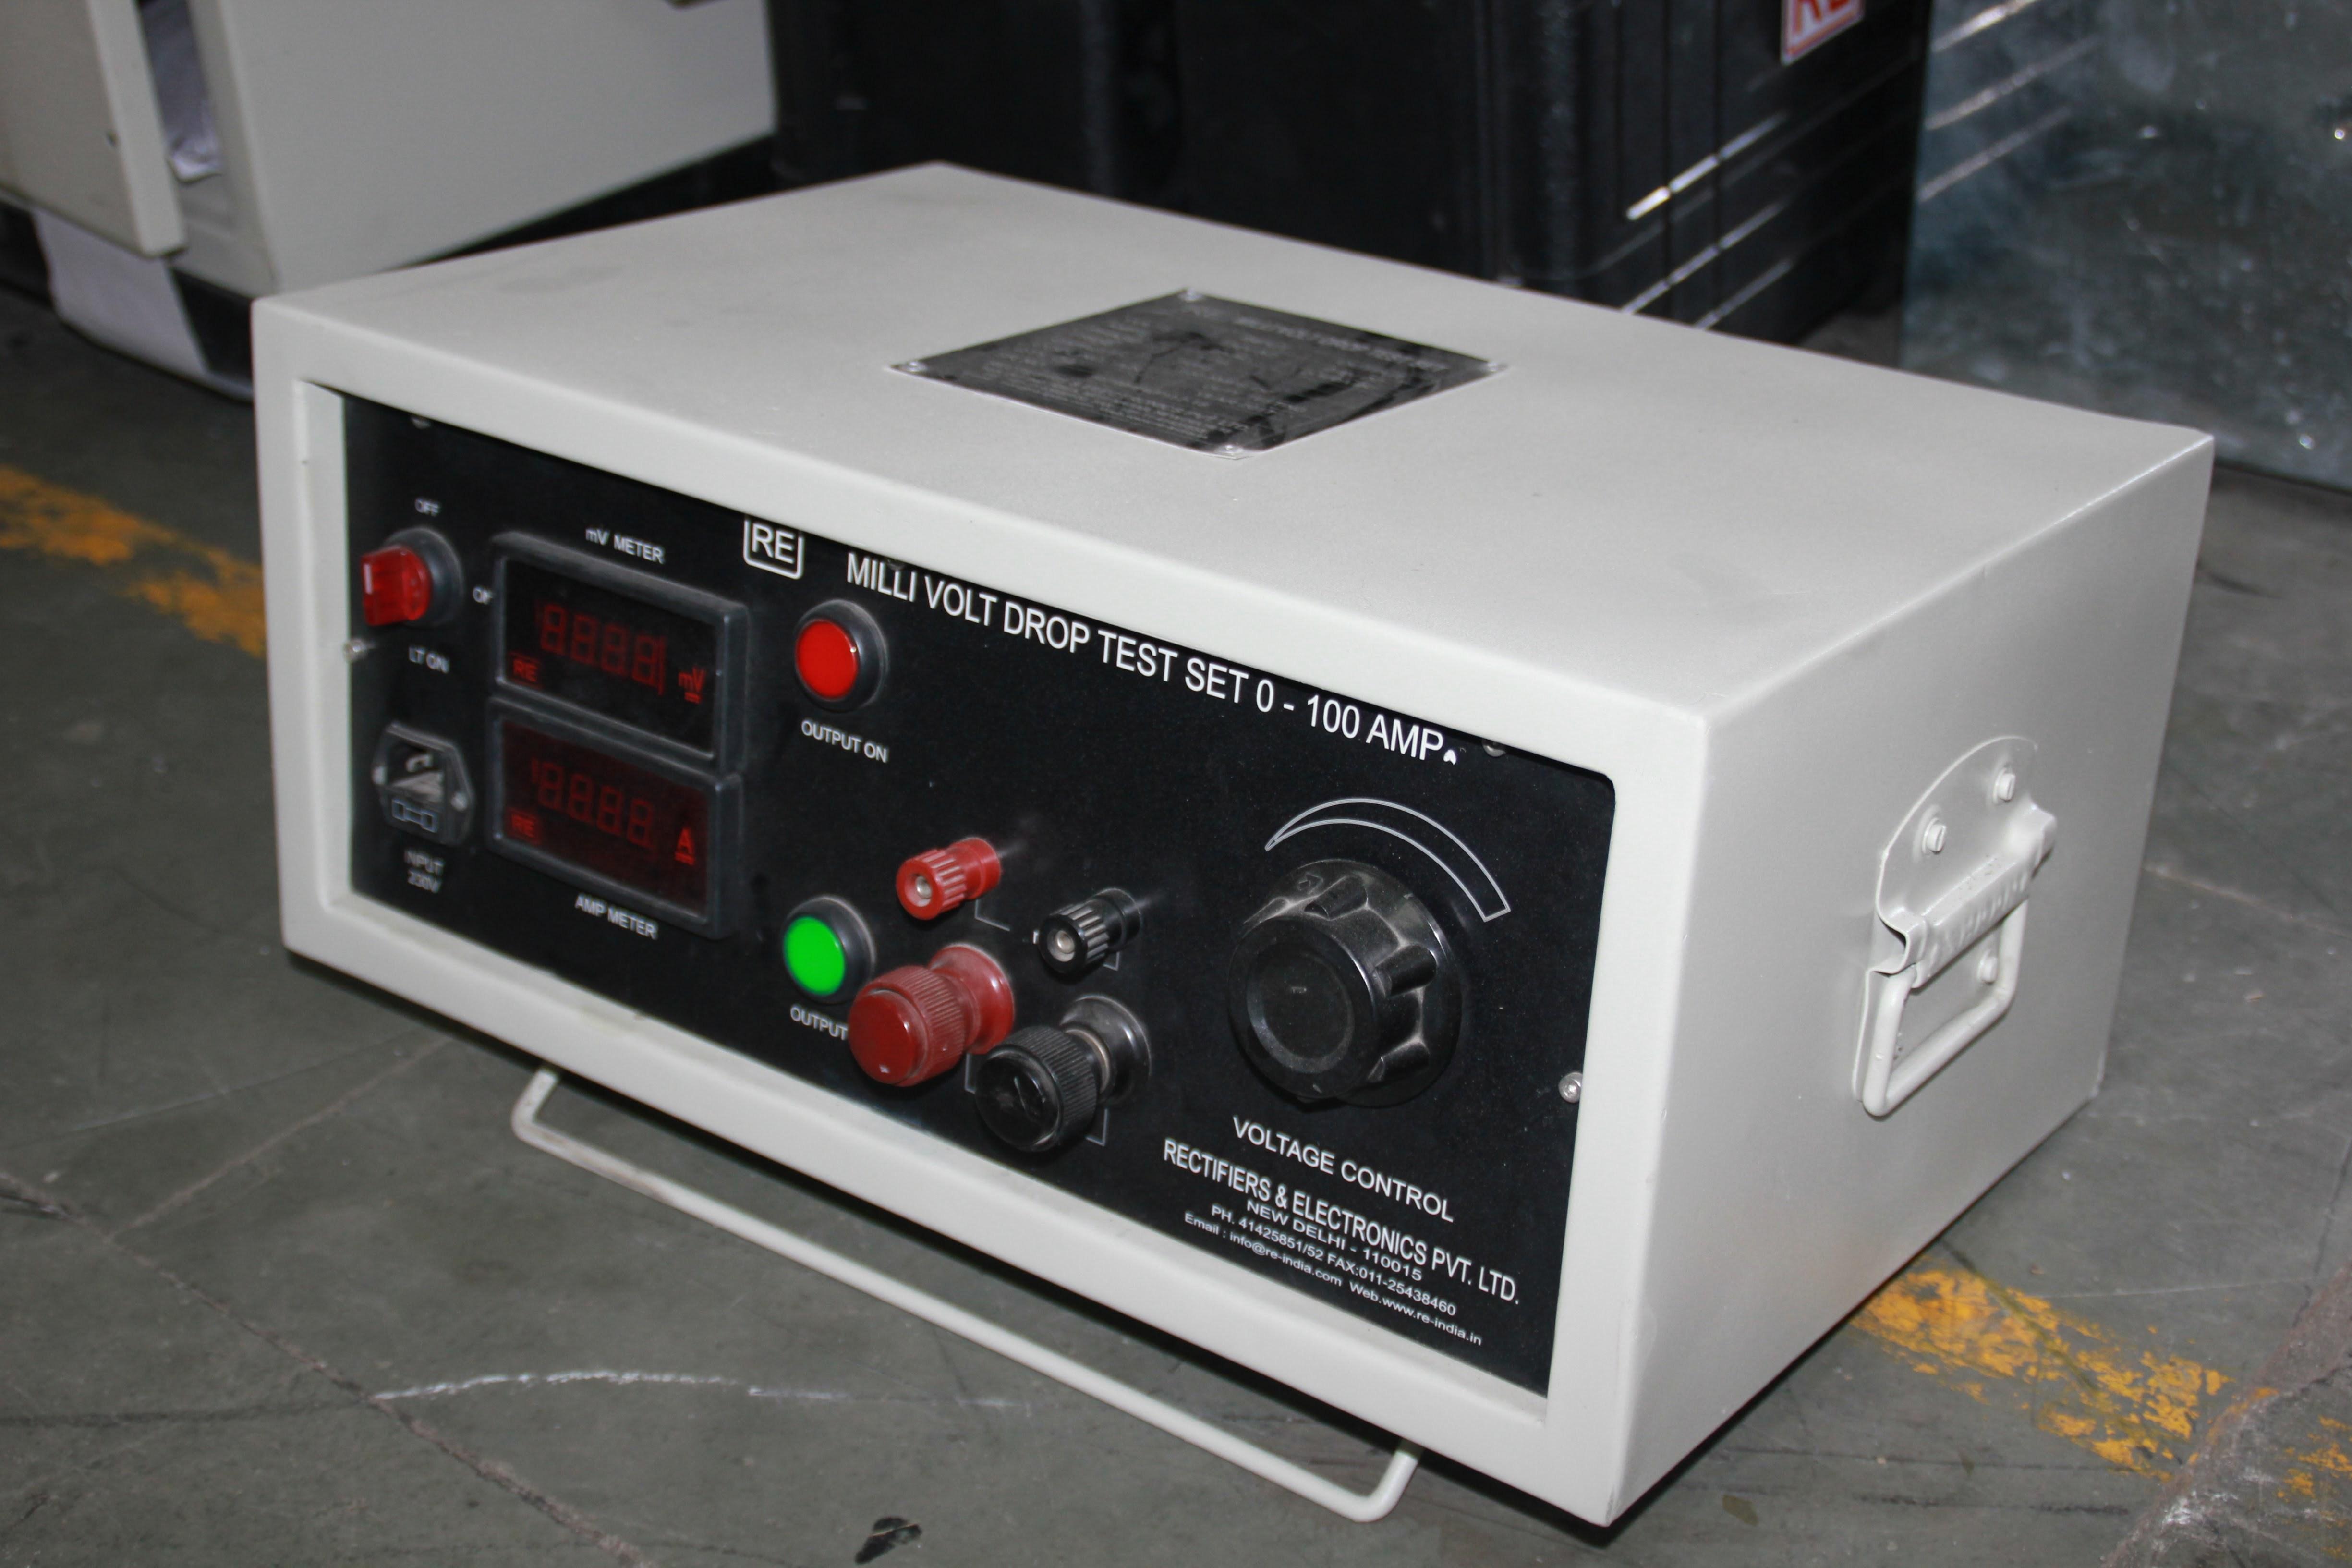 Milli Volt Drop Test Set ( Up to 3000Amp)